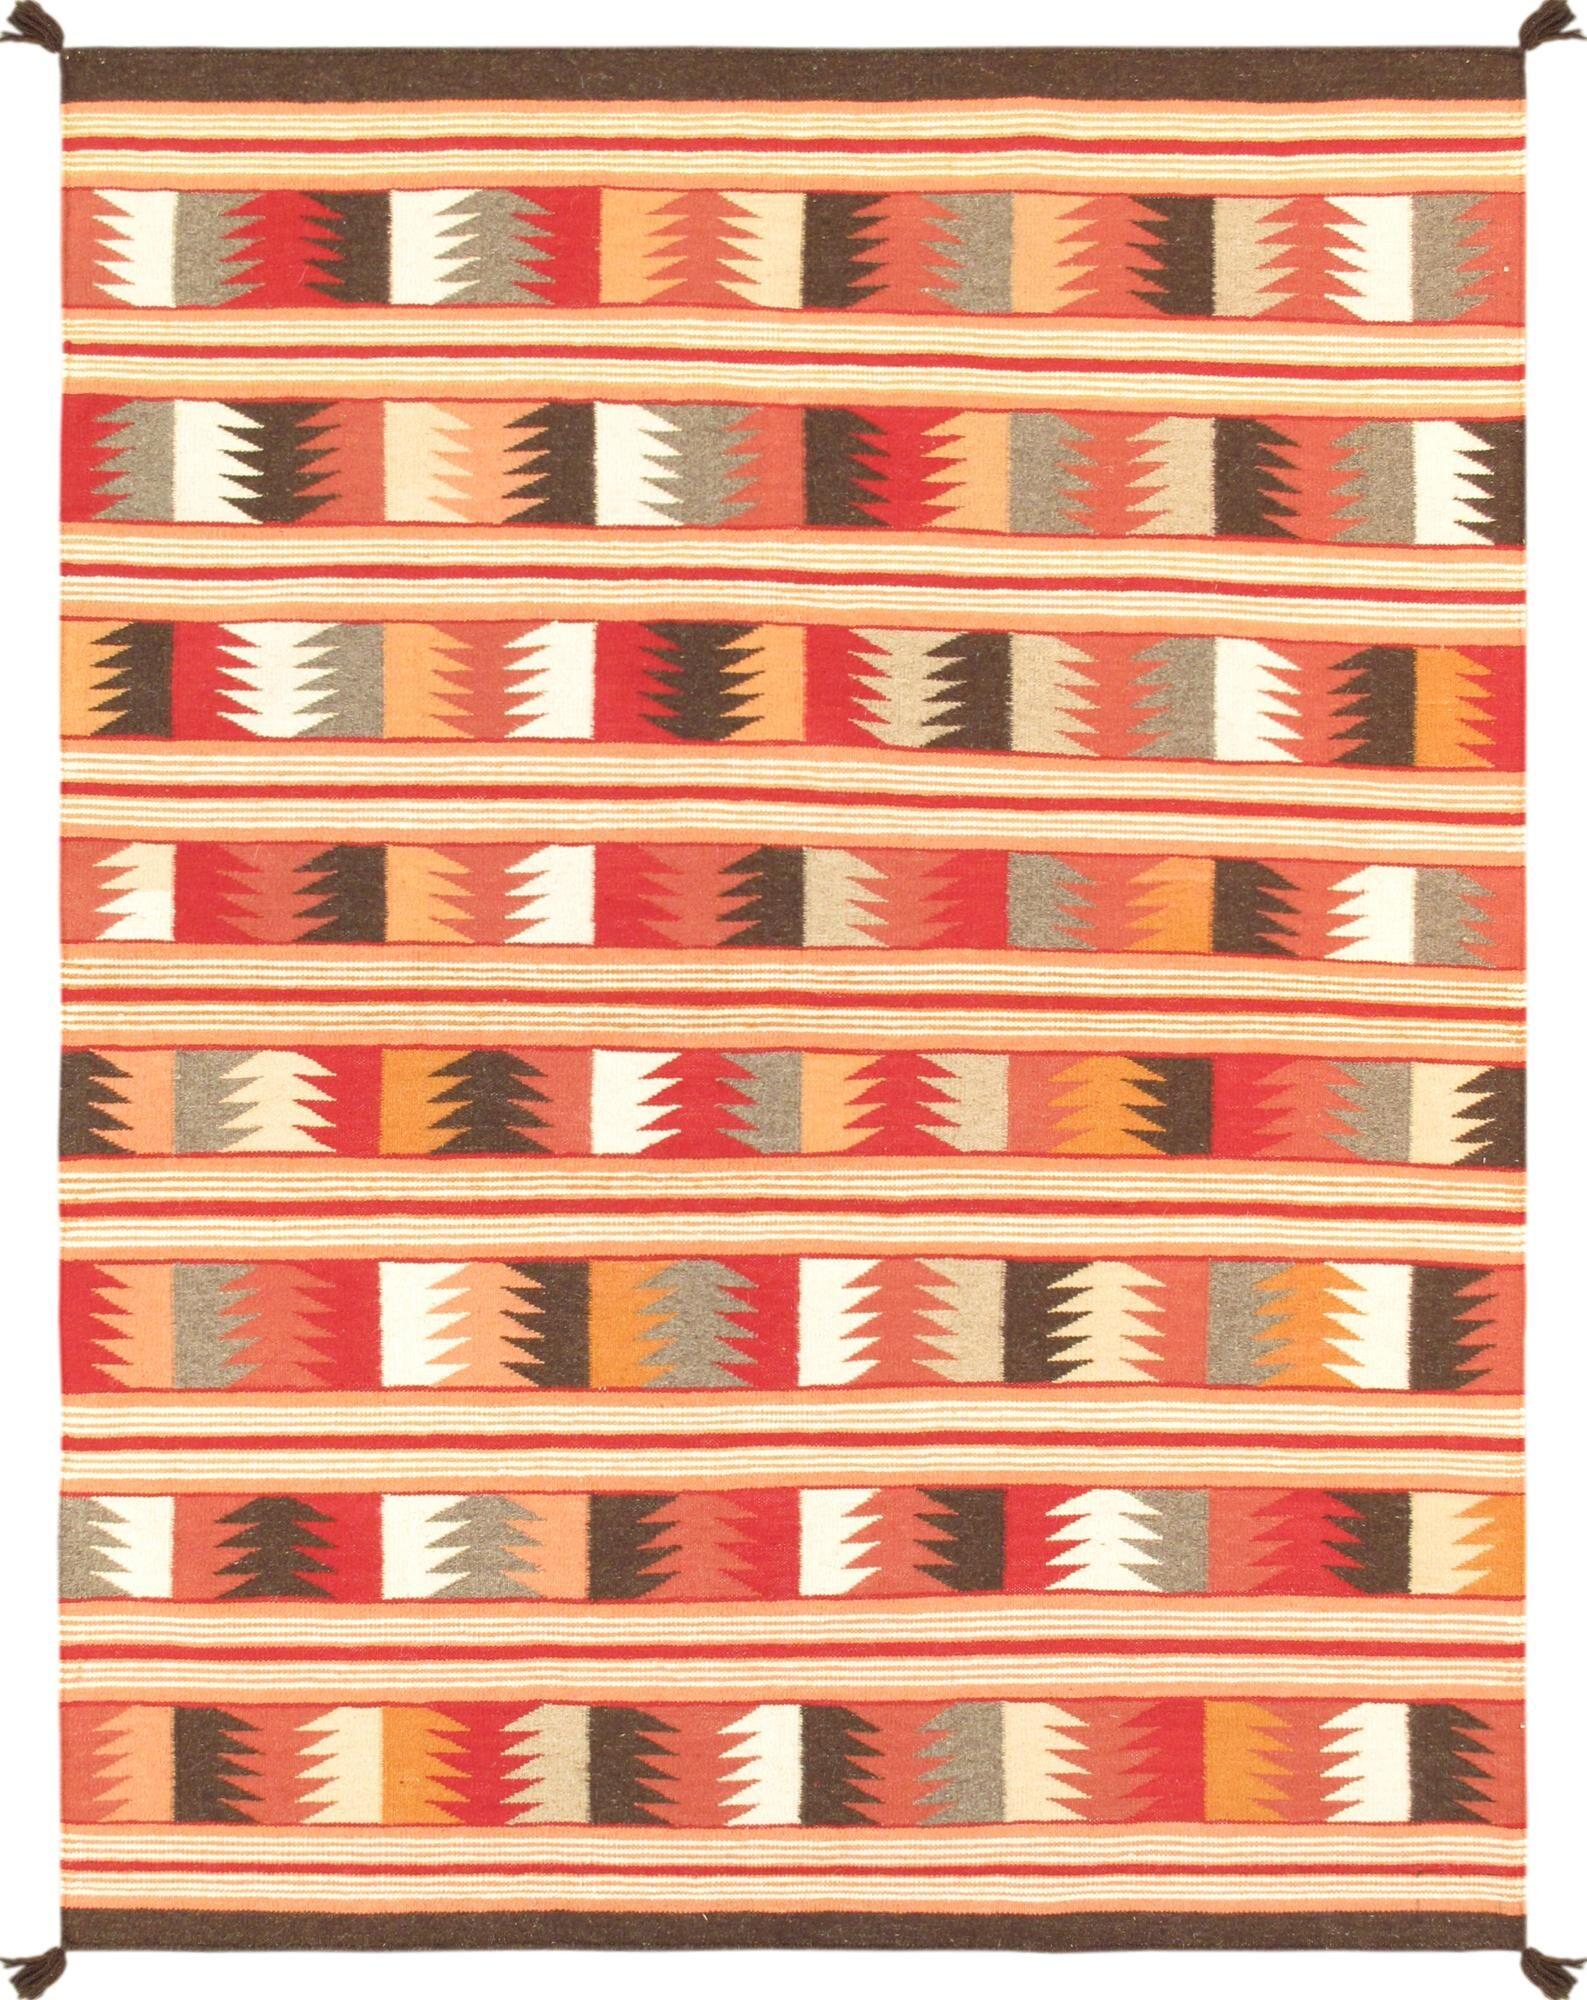 Kilim Hand-Woven Area Rug